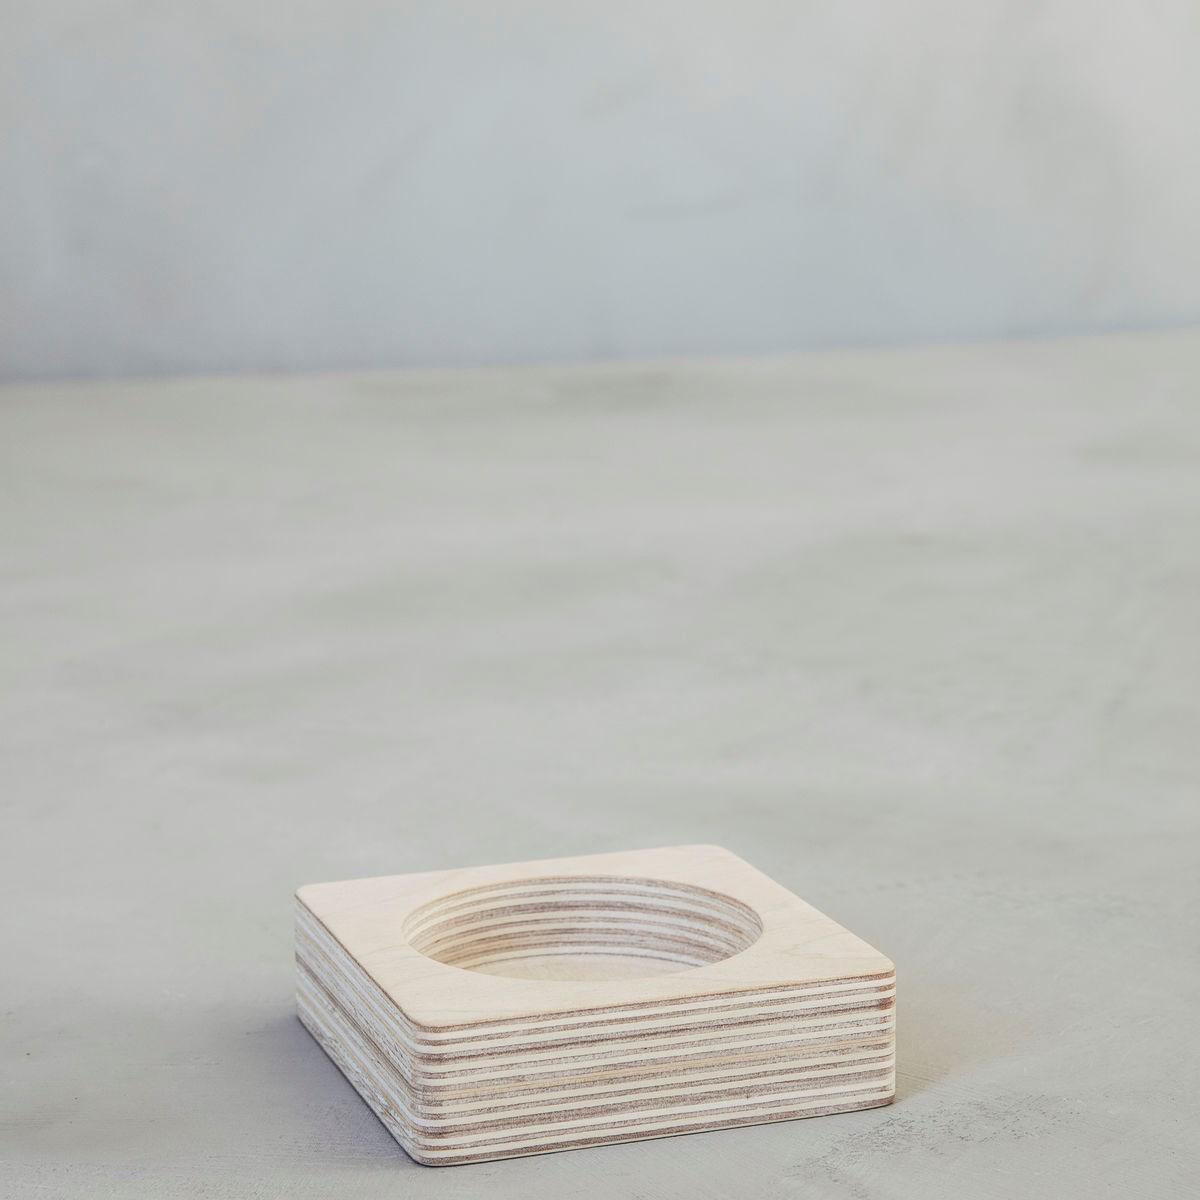 Úložný zásobník na gumy/ sponky ROUND dýha_0